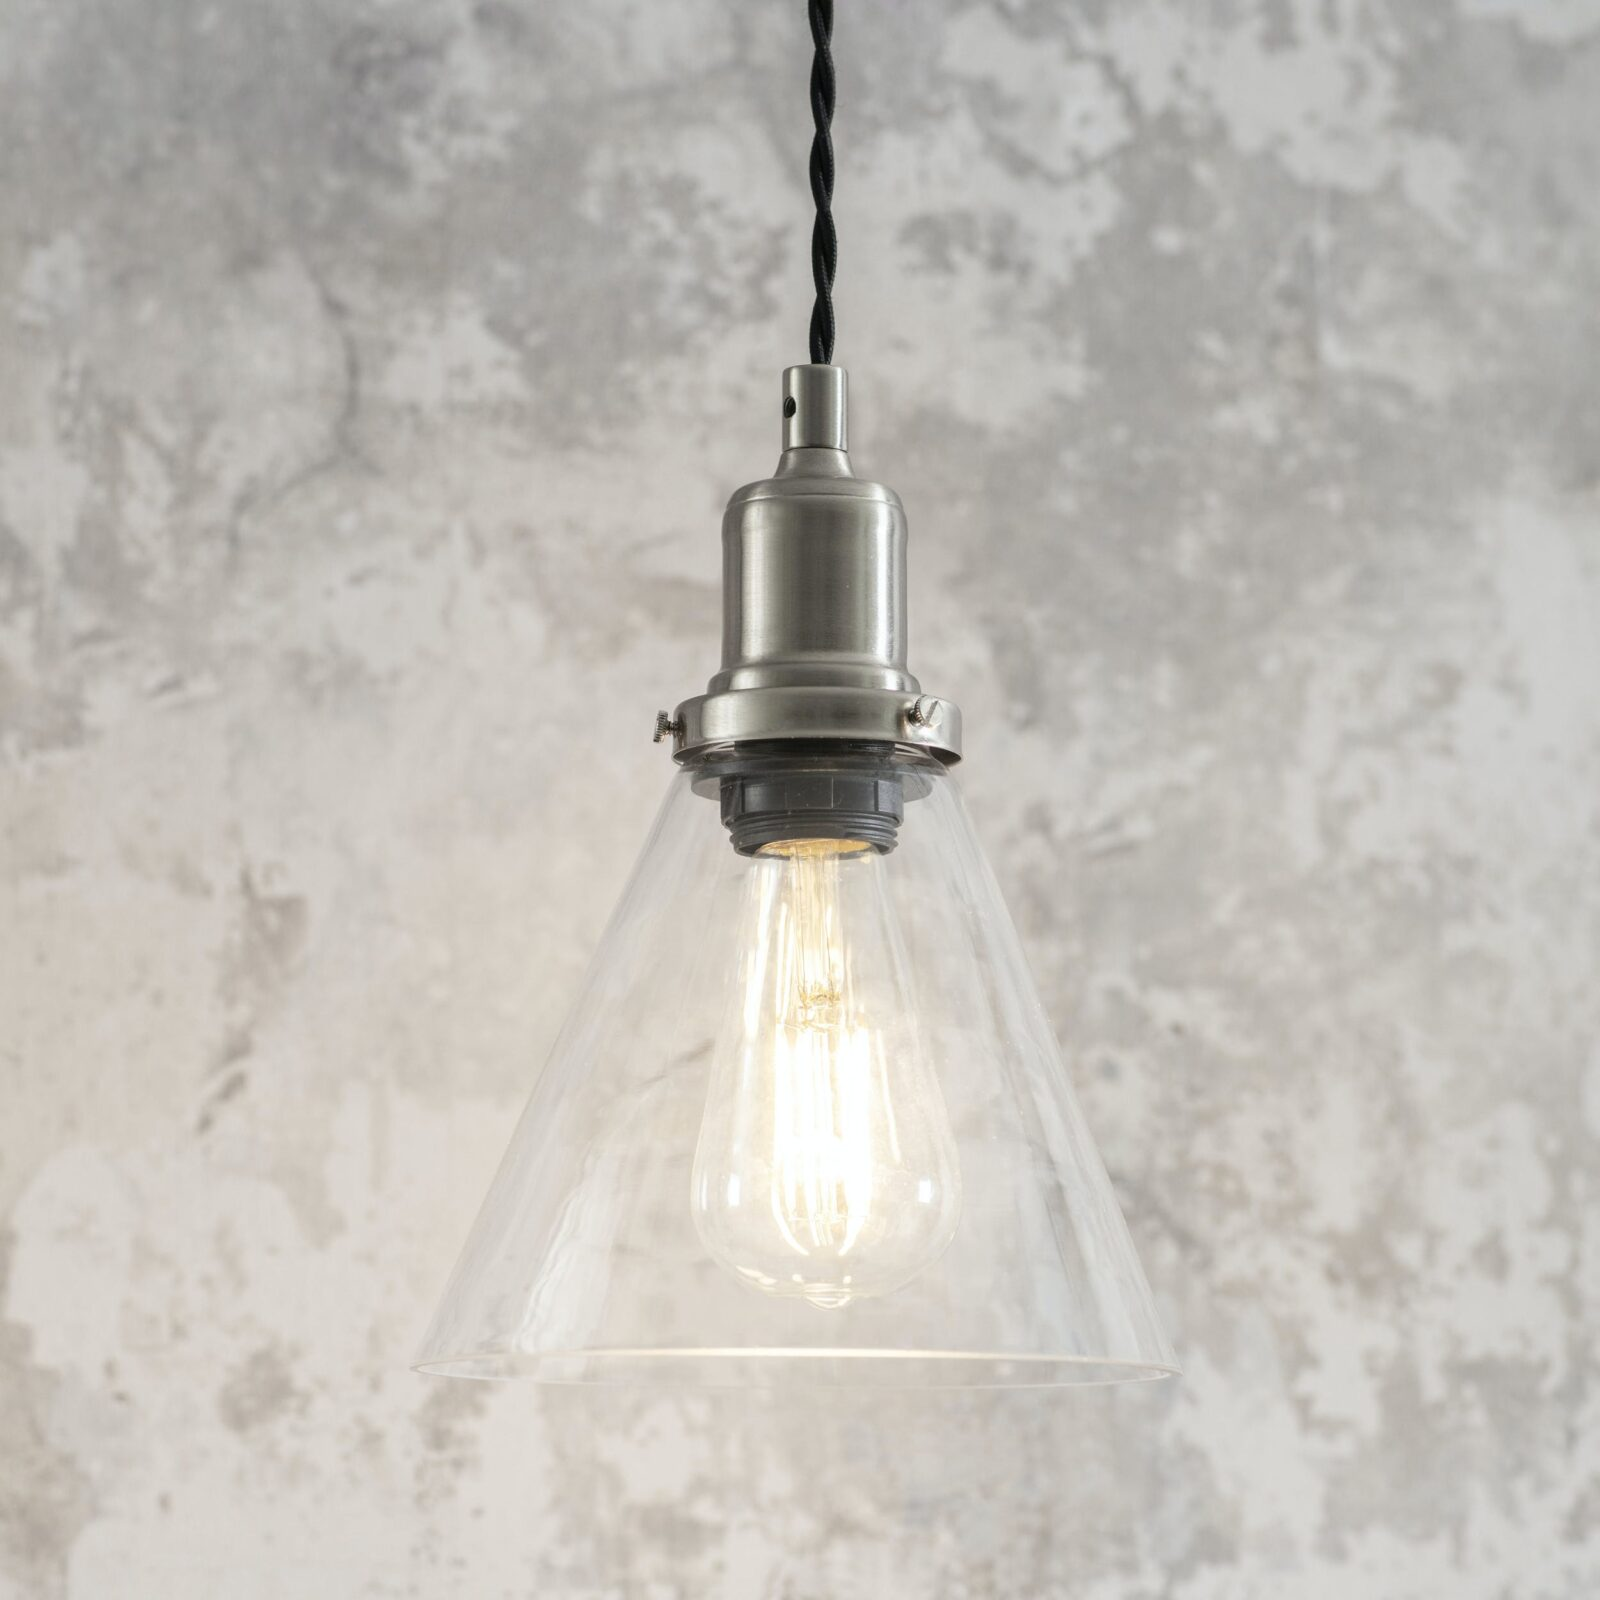 Hoxton Cone Pendant Light Satin Nickel